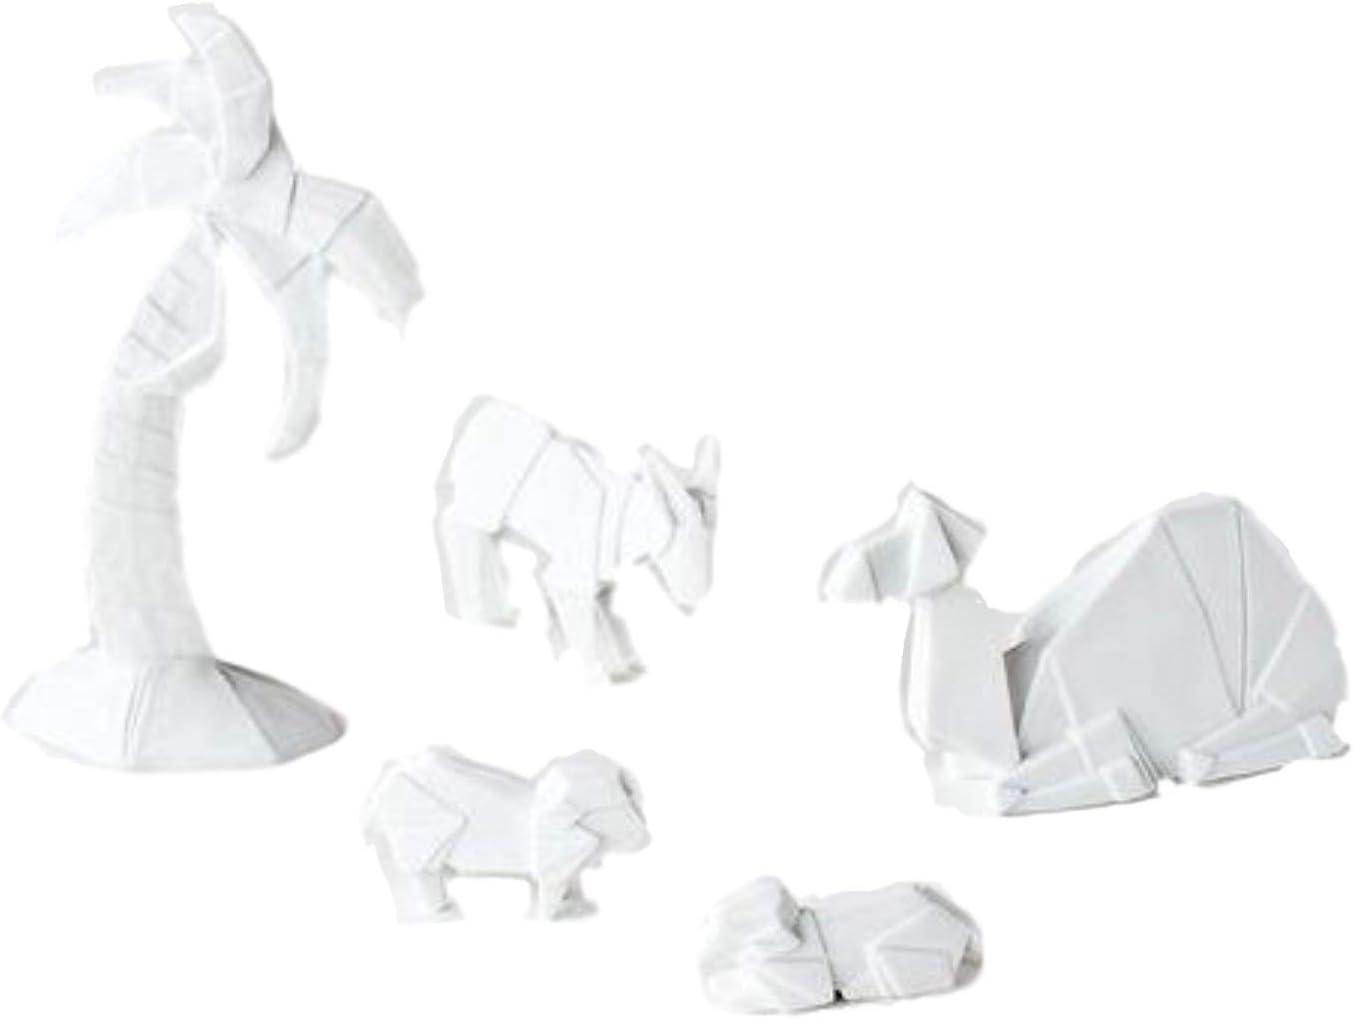 Porcelain Origami Nativity Set Backdrop One Hundred Eighty Degrees